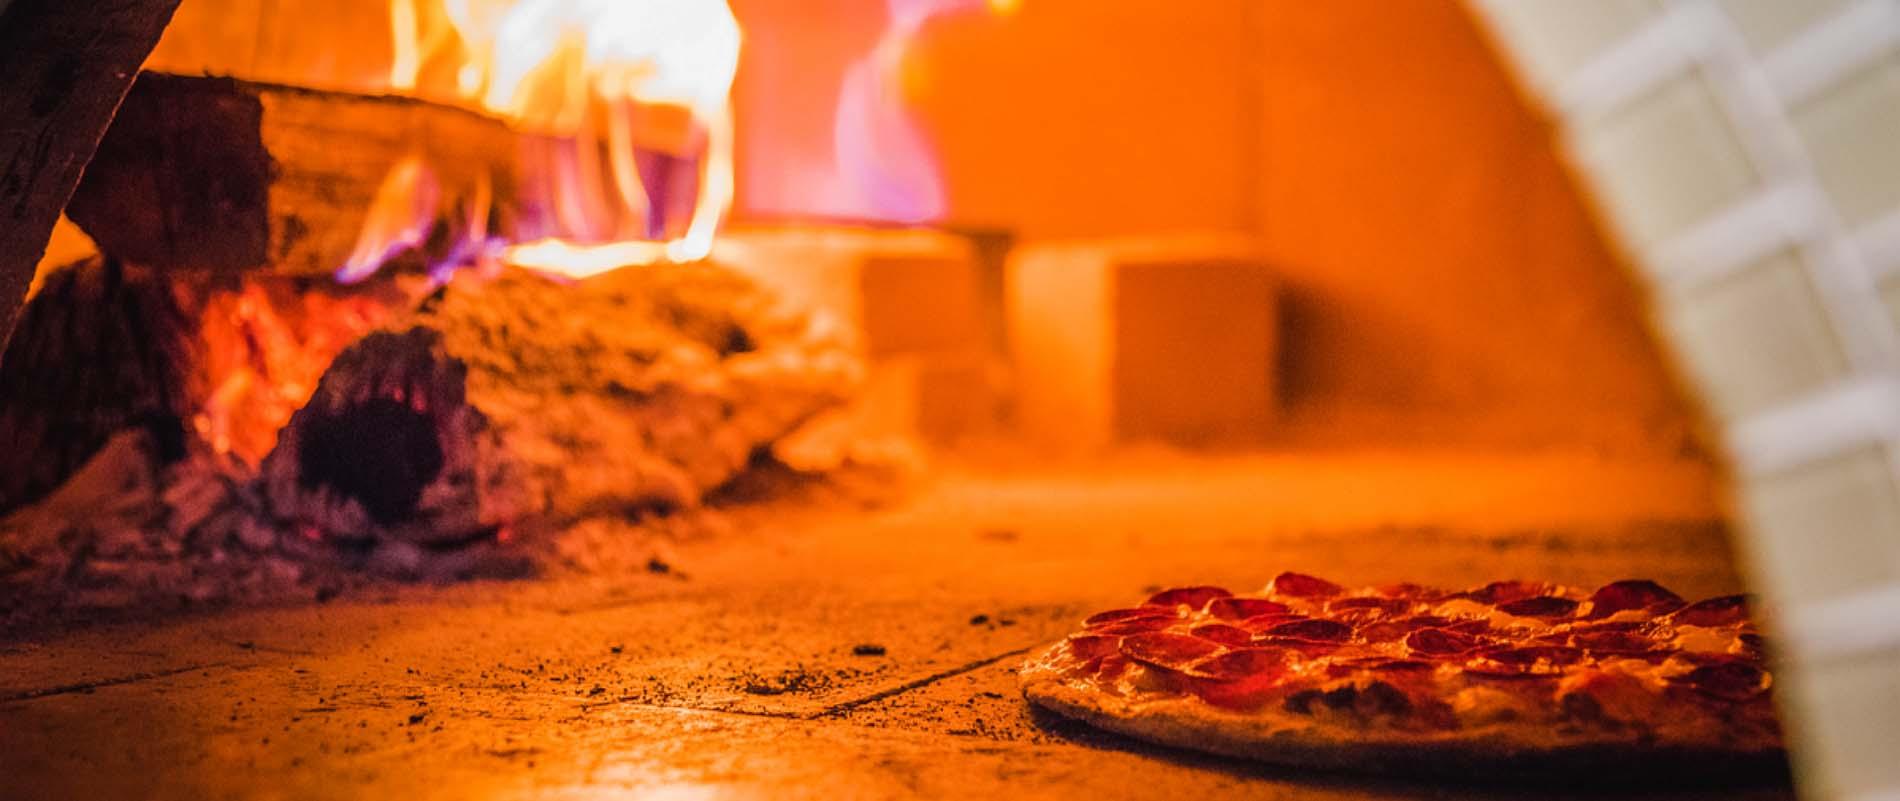 Pizza Restaurant Newark OH   Pizza